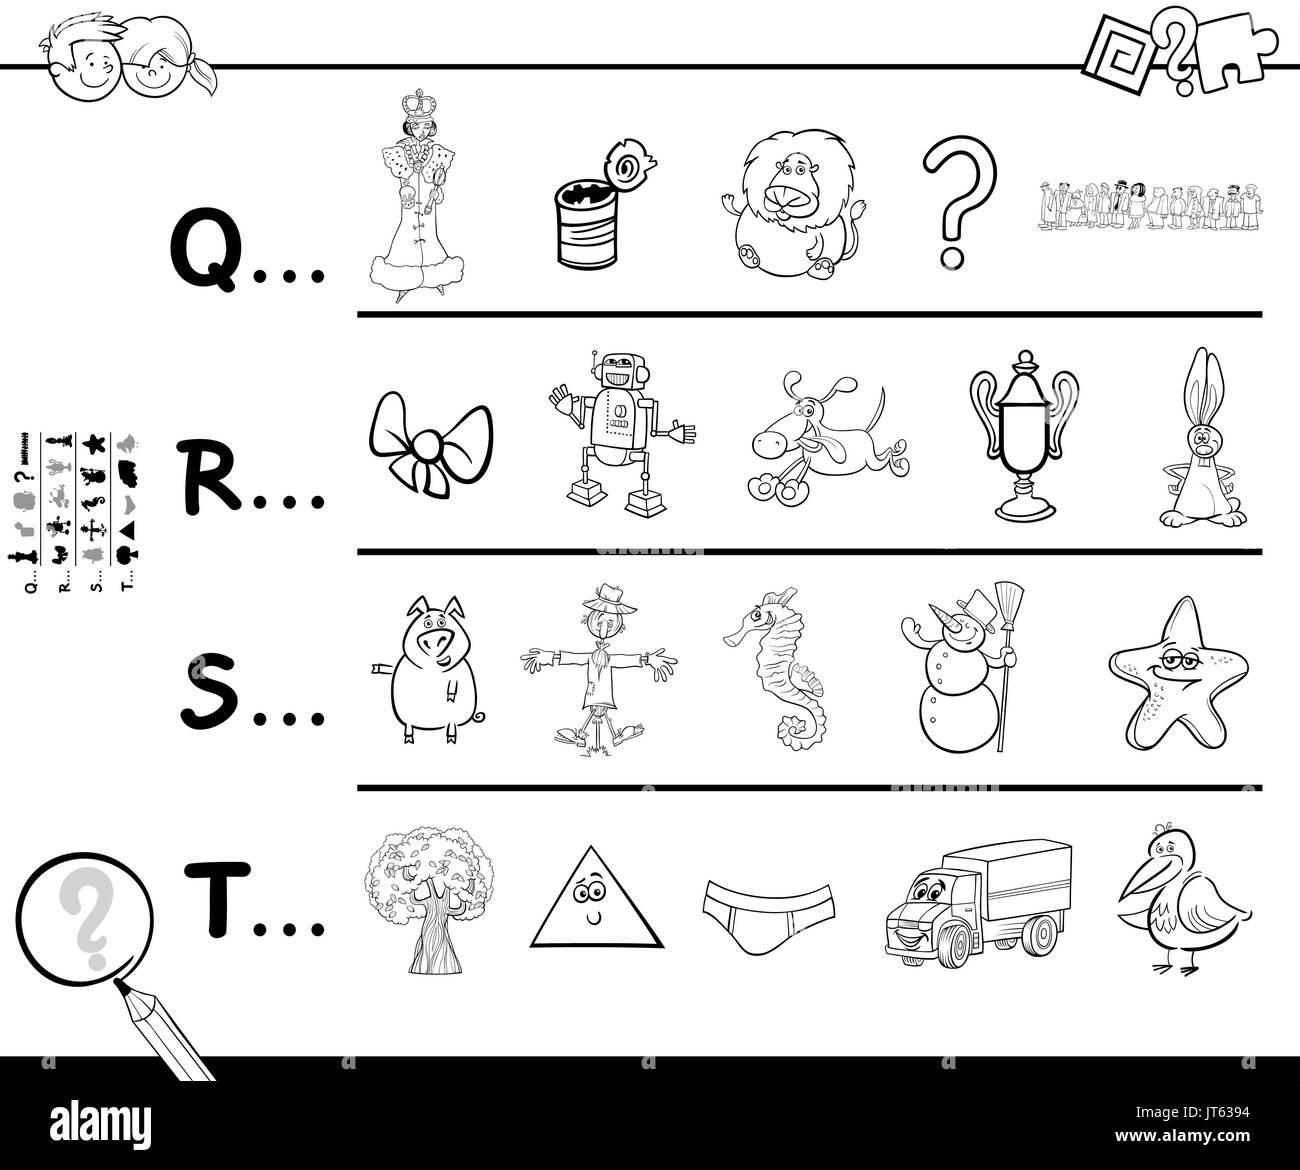 Exelent Letter R Arbeitsblatt Sketch - Kindergarten Arbeitsblatt ...